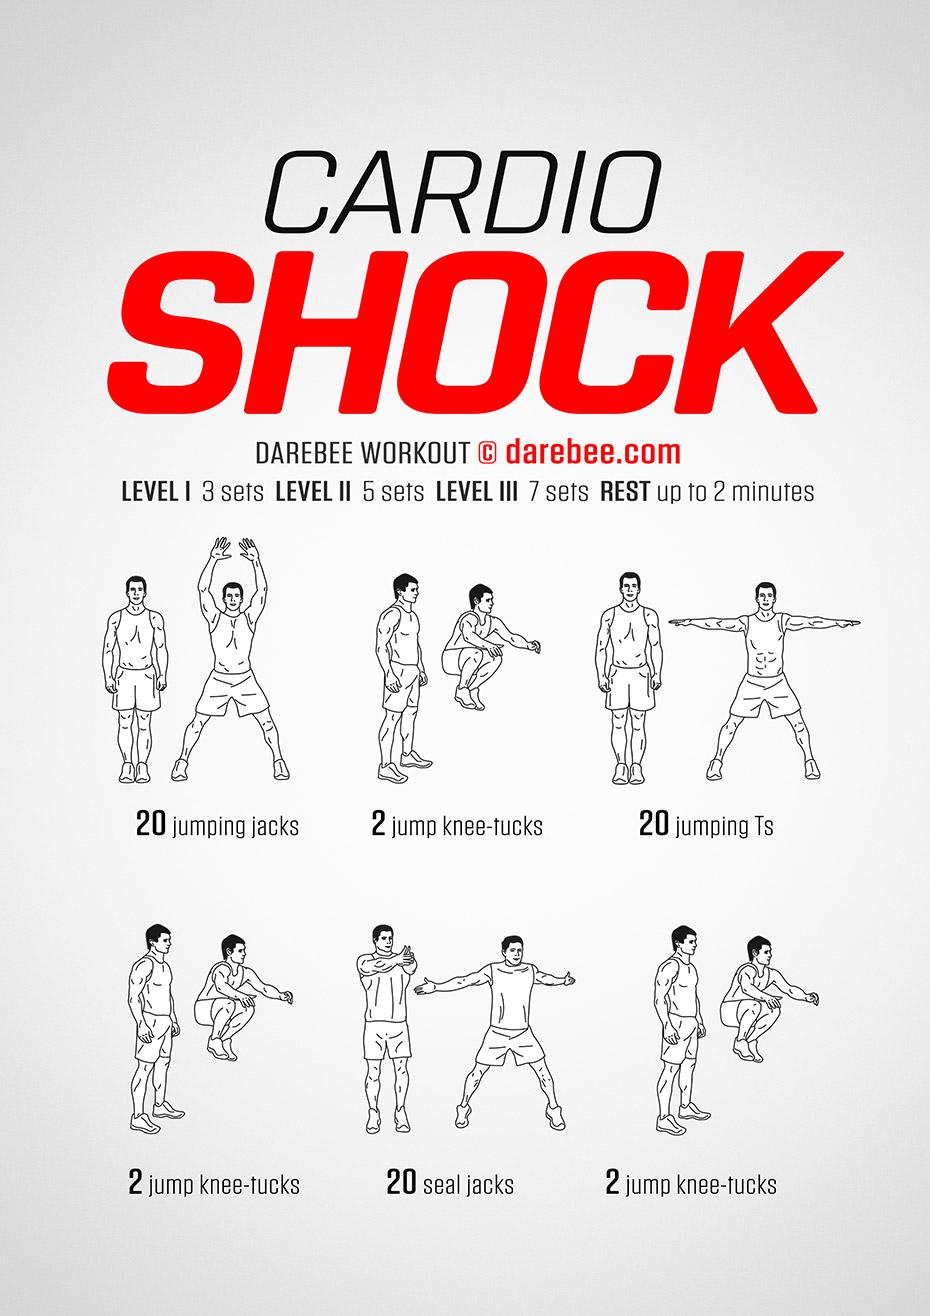 Cardio Shock Workout